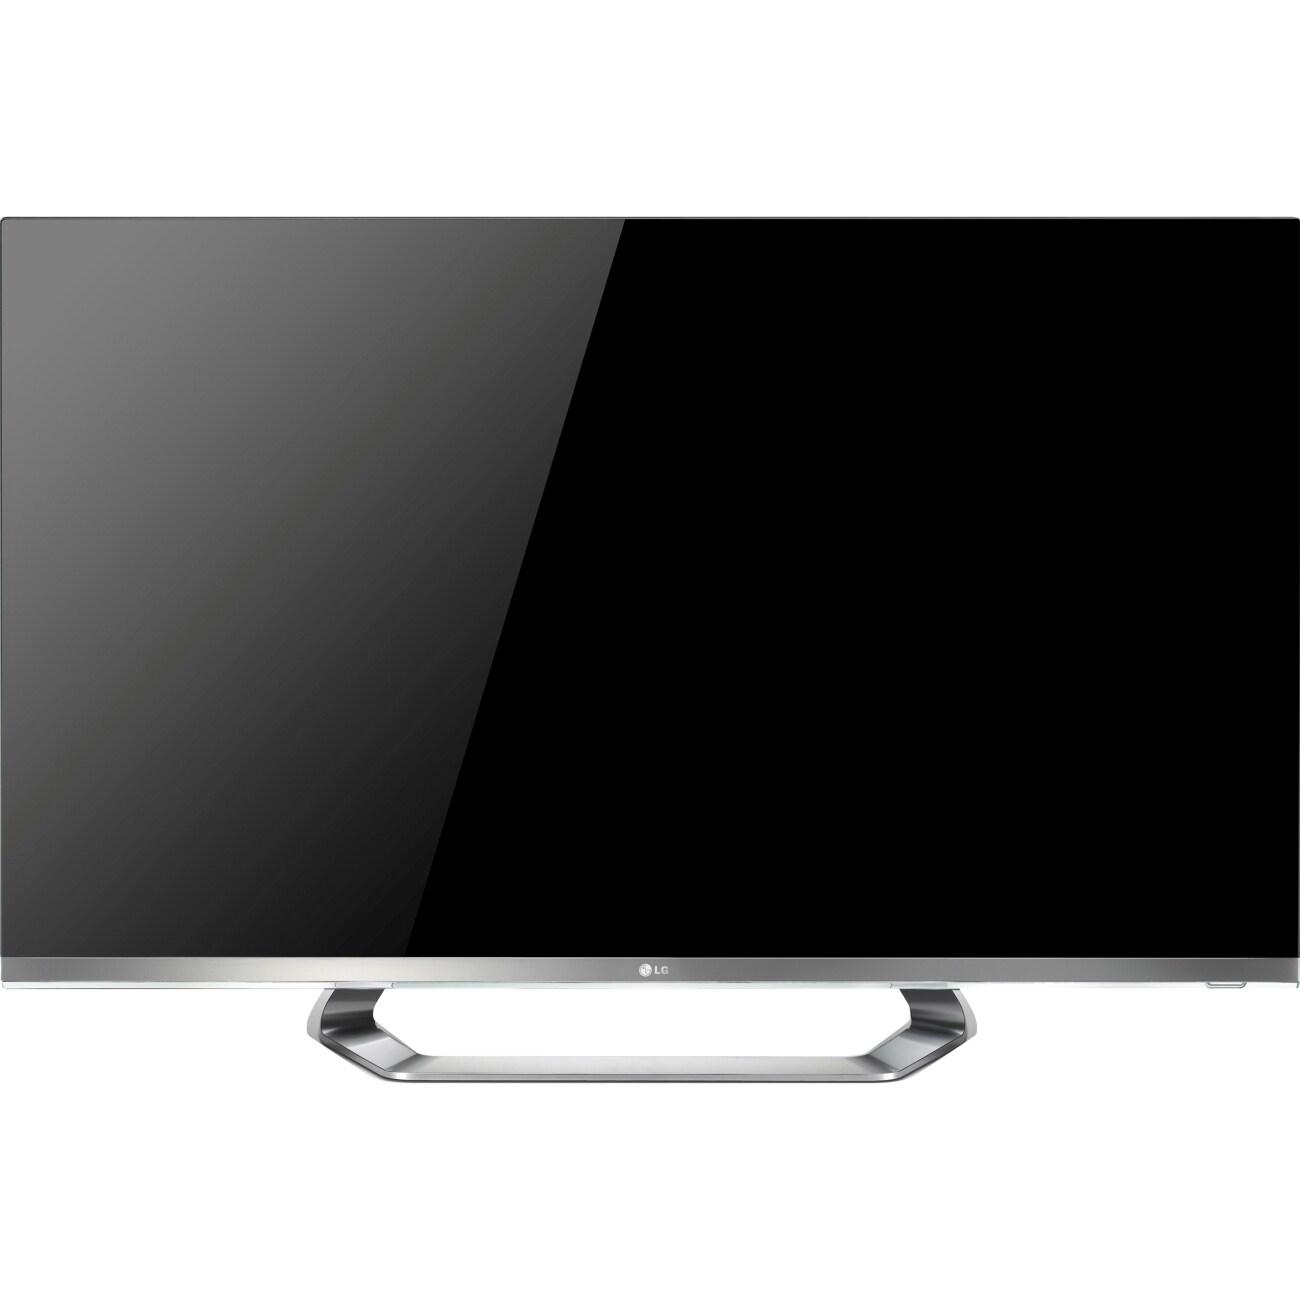 LG 55LM8600 55-inch 3D 1080p 16:9 LED-LCD HDTV